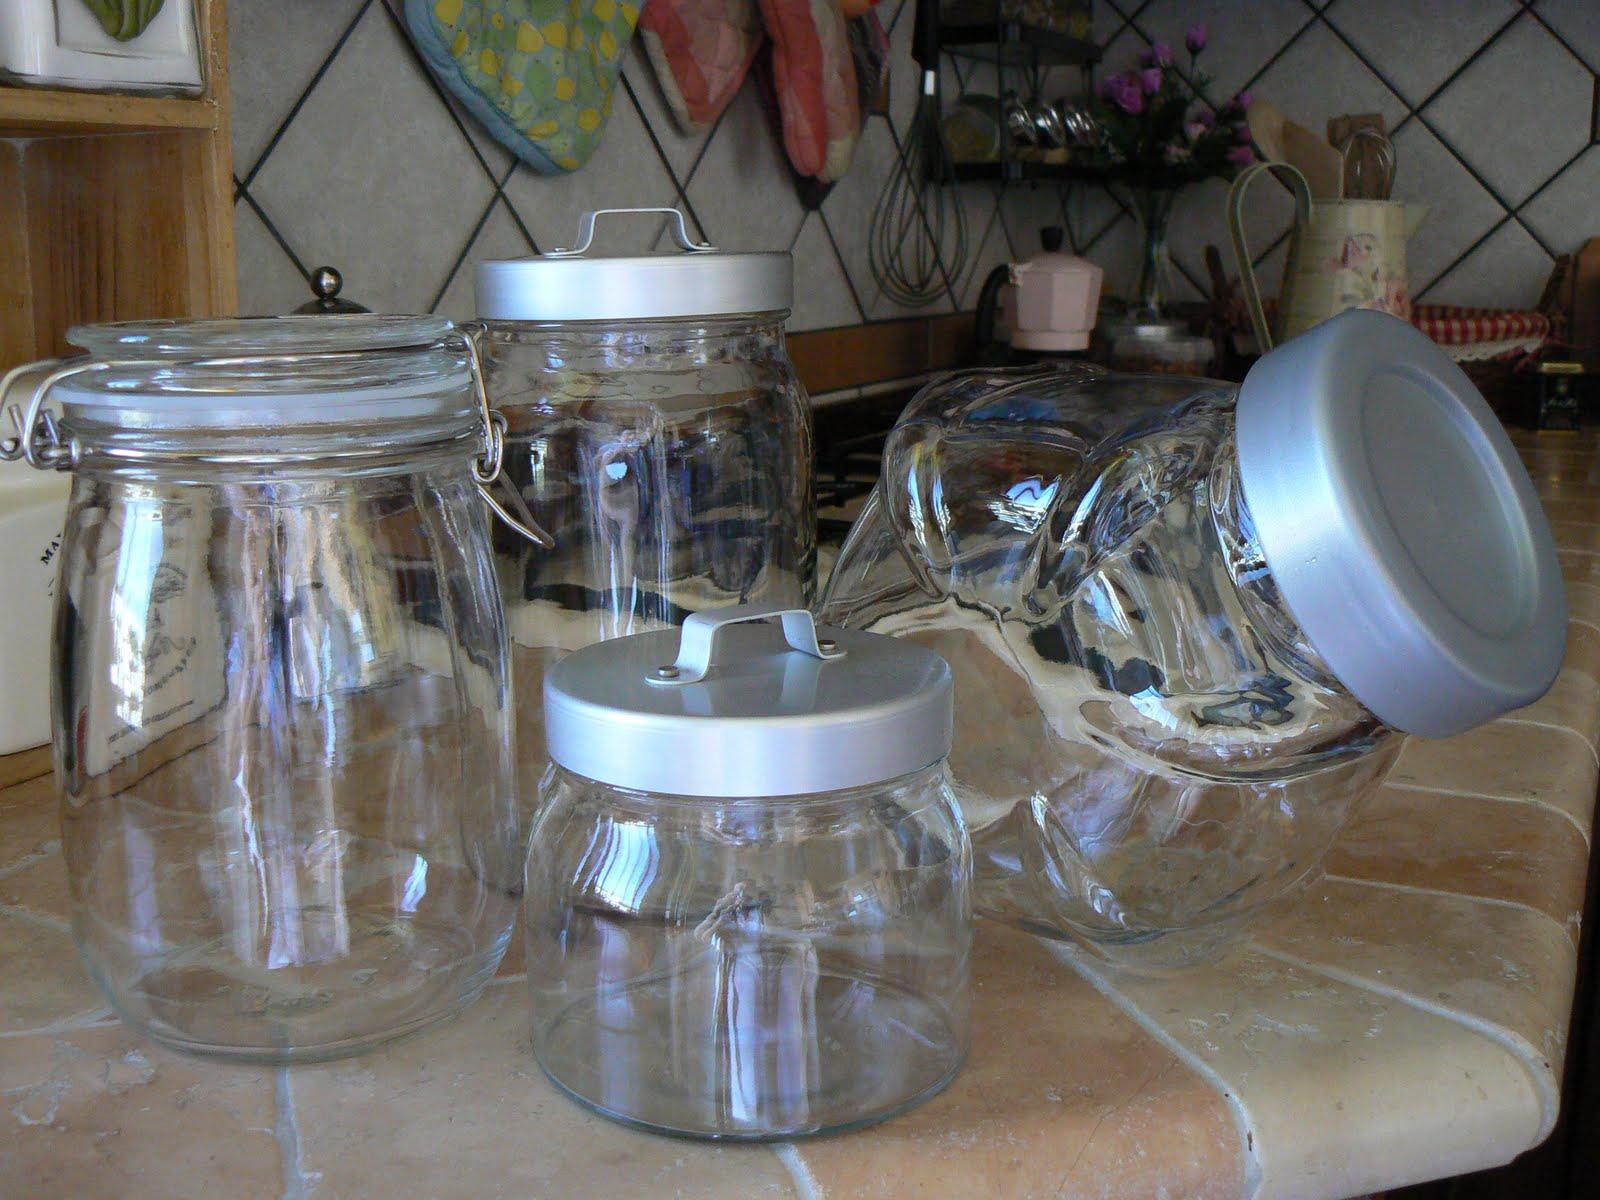 Candele Da Giardino Ikea : Lanterne ikea tutte le offerte cascare a fagiolo